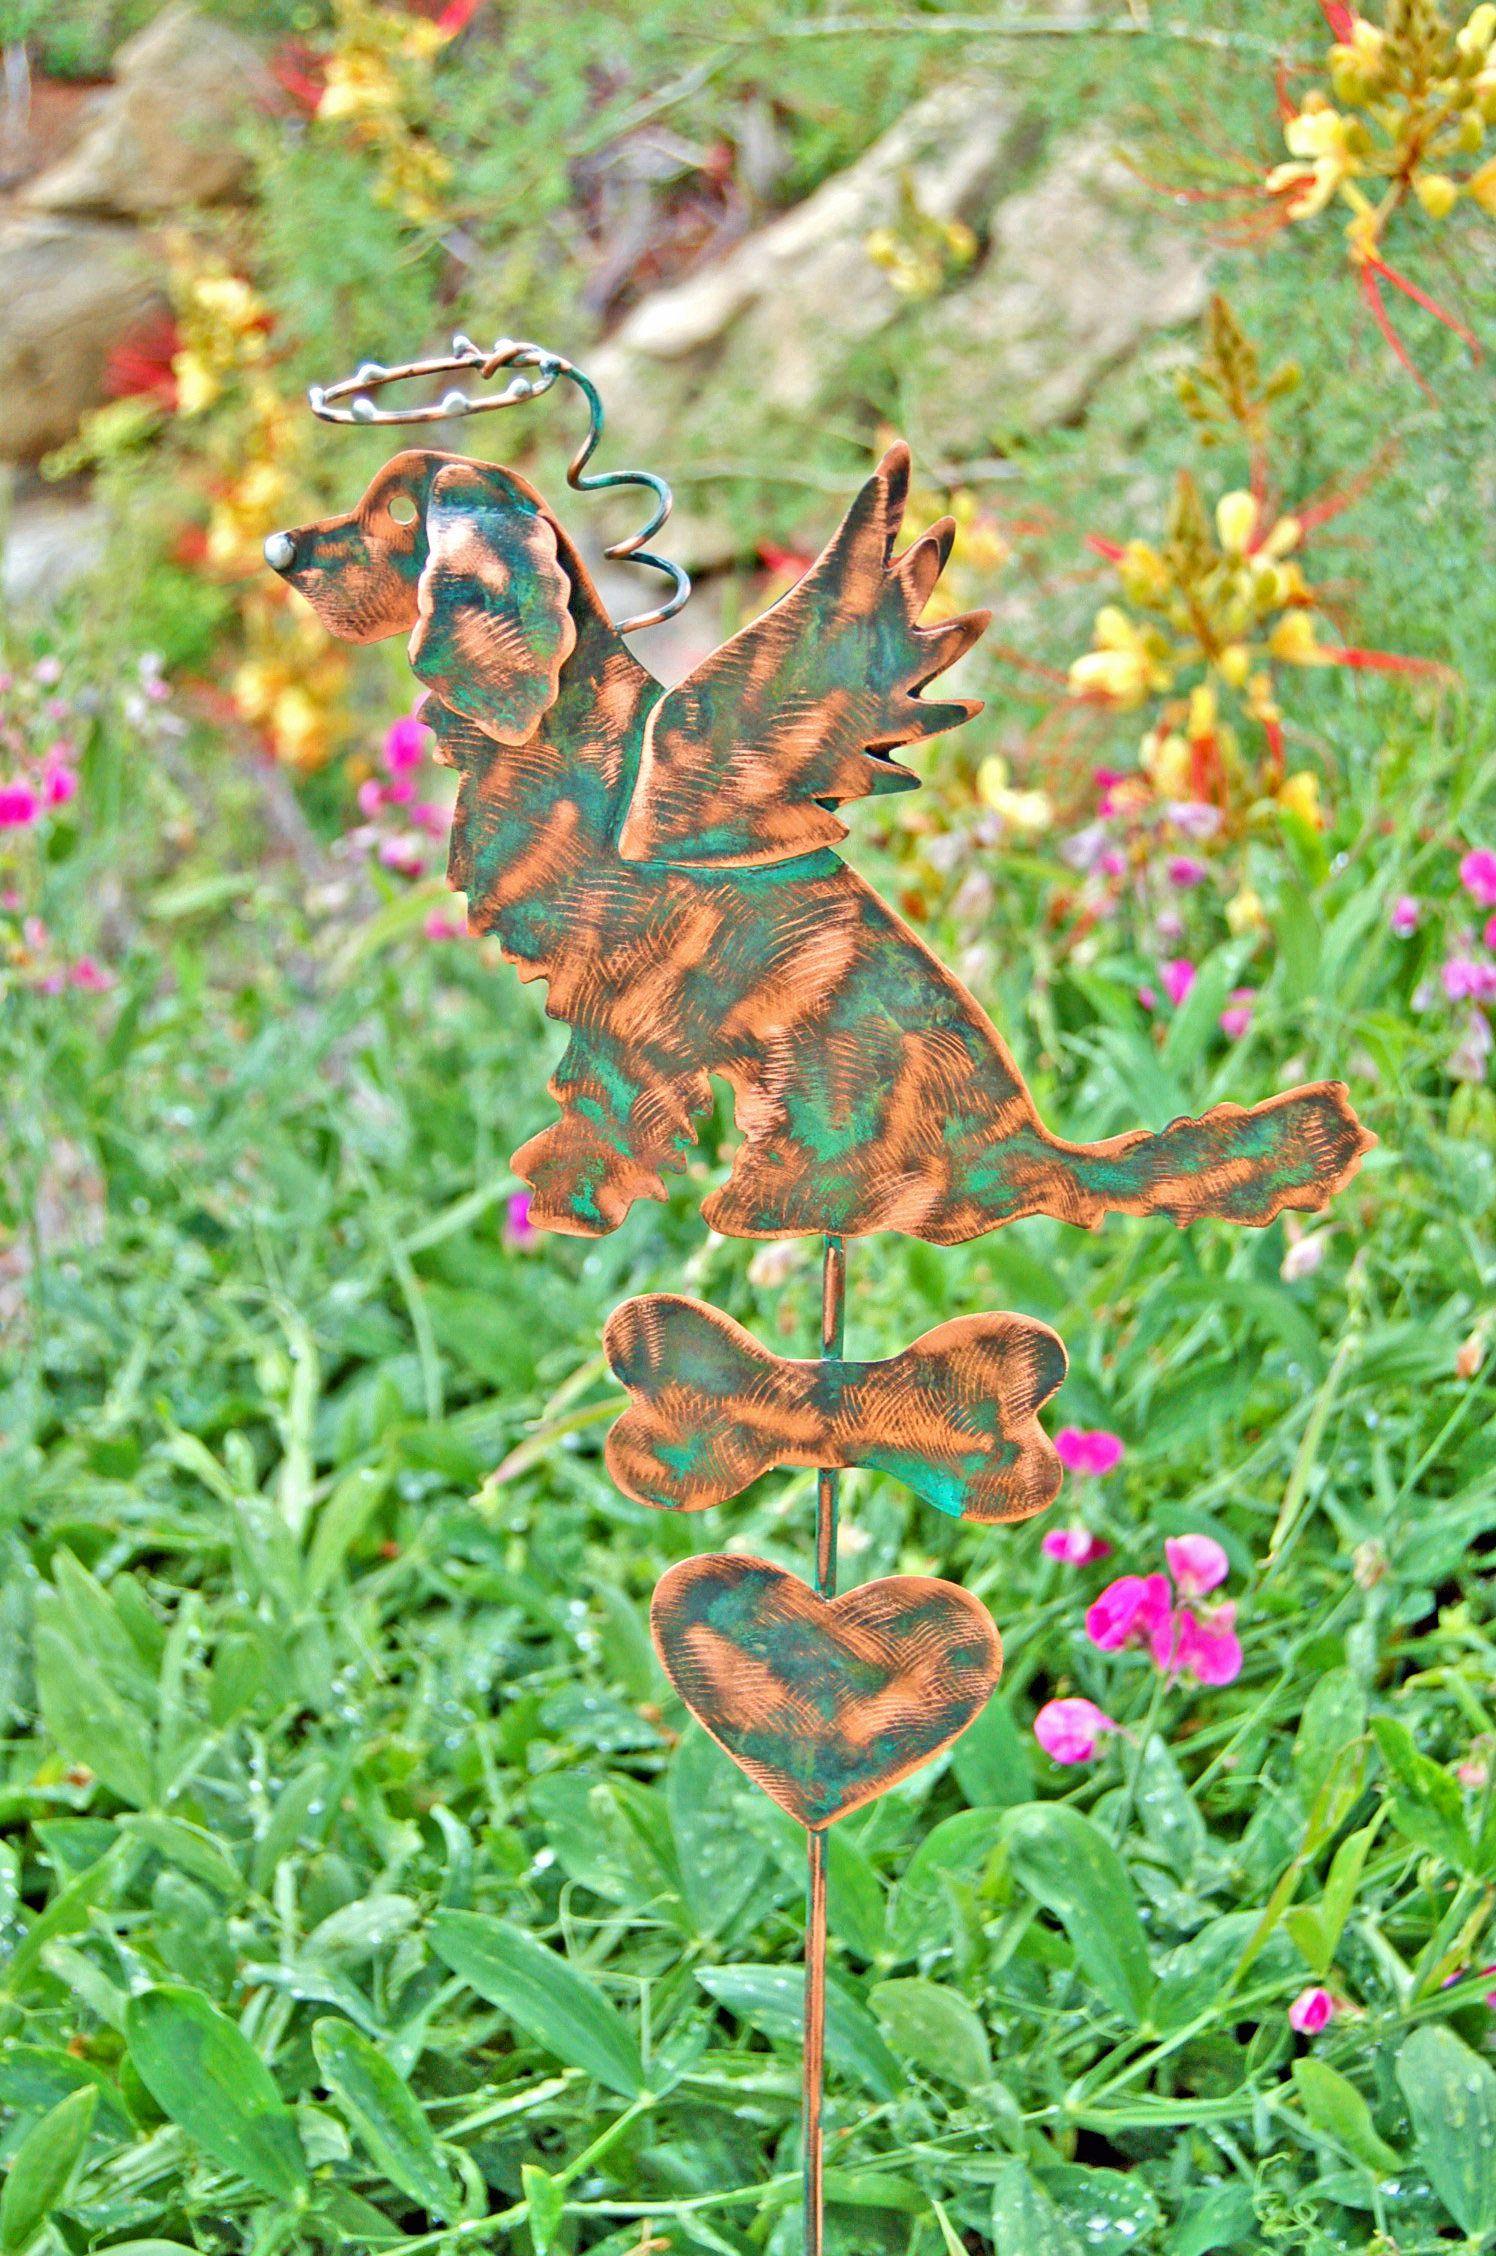 Ordinaire Golden Retriever Metal Garden Art Pet Memorial Garden Stake,Yard Art, Garden  Copper Art, Angel Pet, Outdoor Pet Sculpture Grave Marker